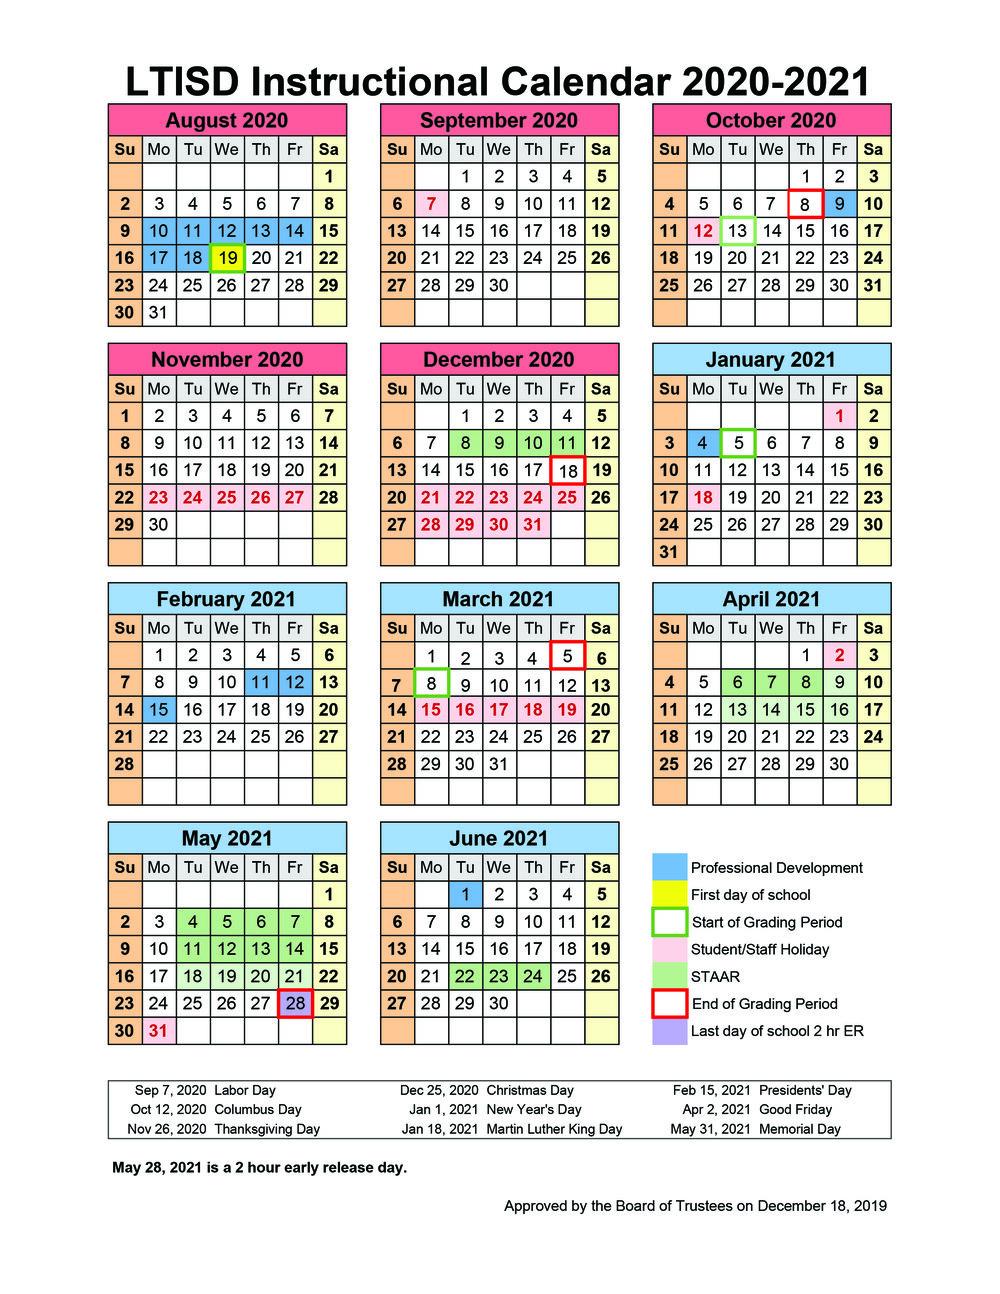 School Board Approves 2020-2021 Instructional Calendar